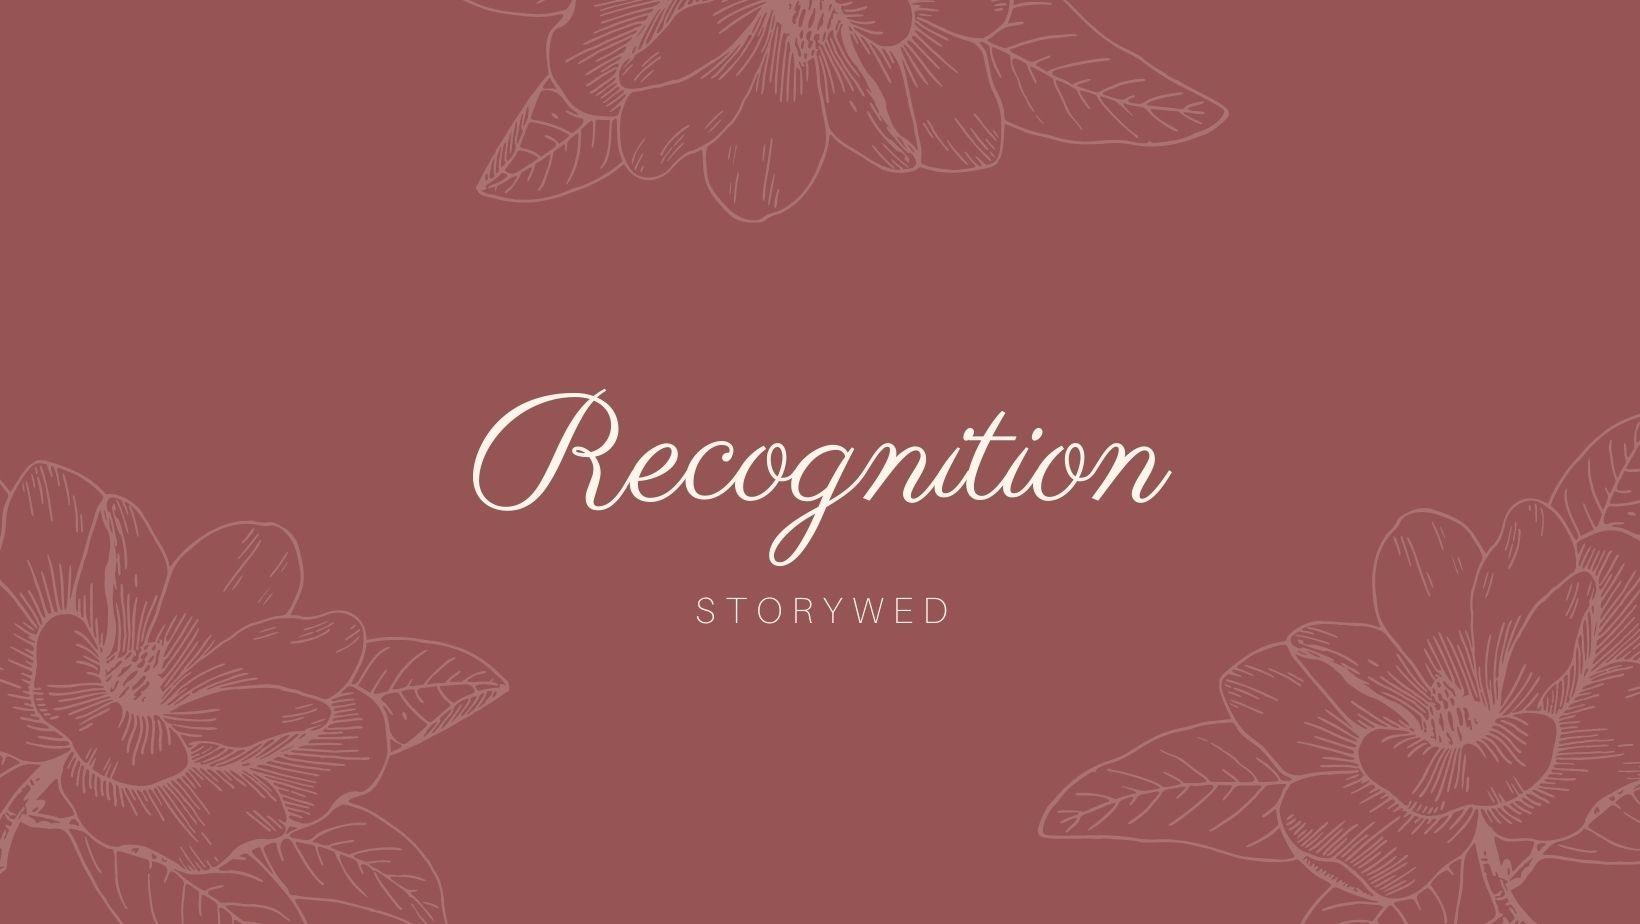 Recognition 幸福故事館婚禮顧問。好評